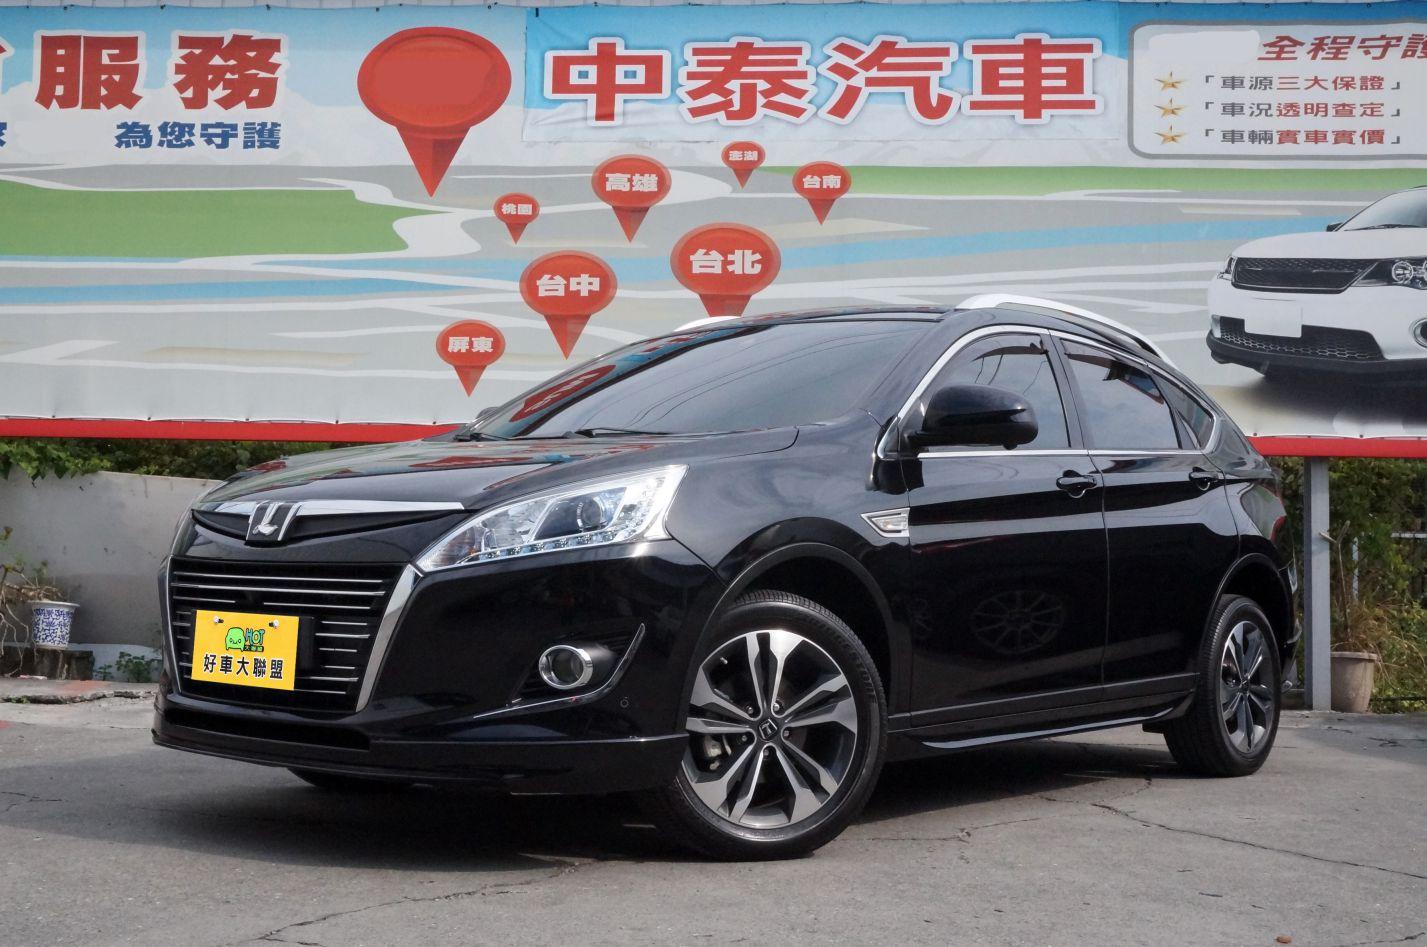 2016 Luxgen 納智捷 U6 turbo